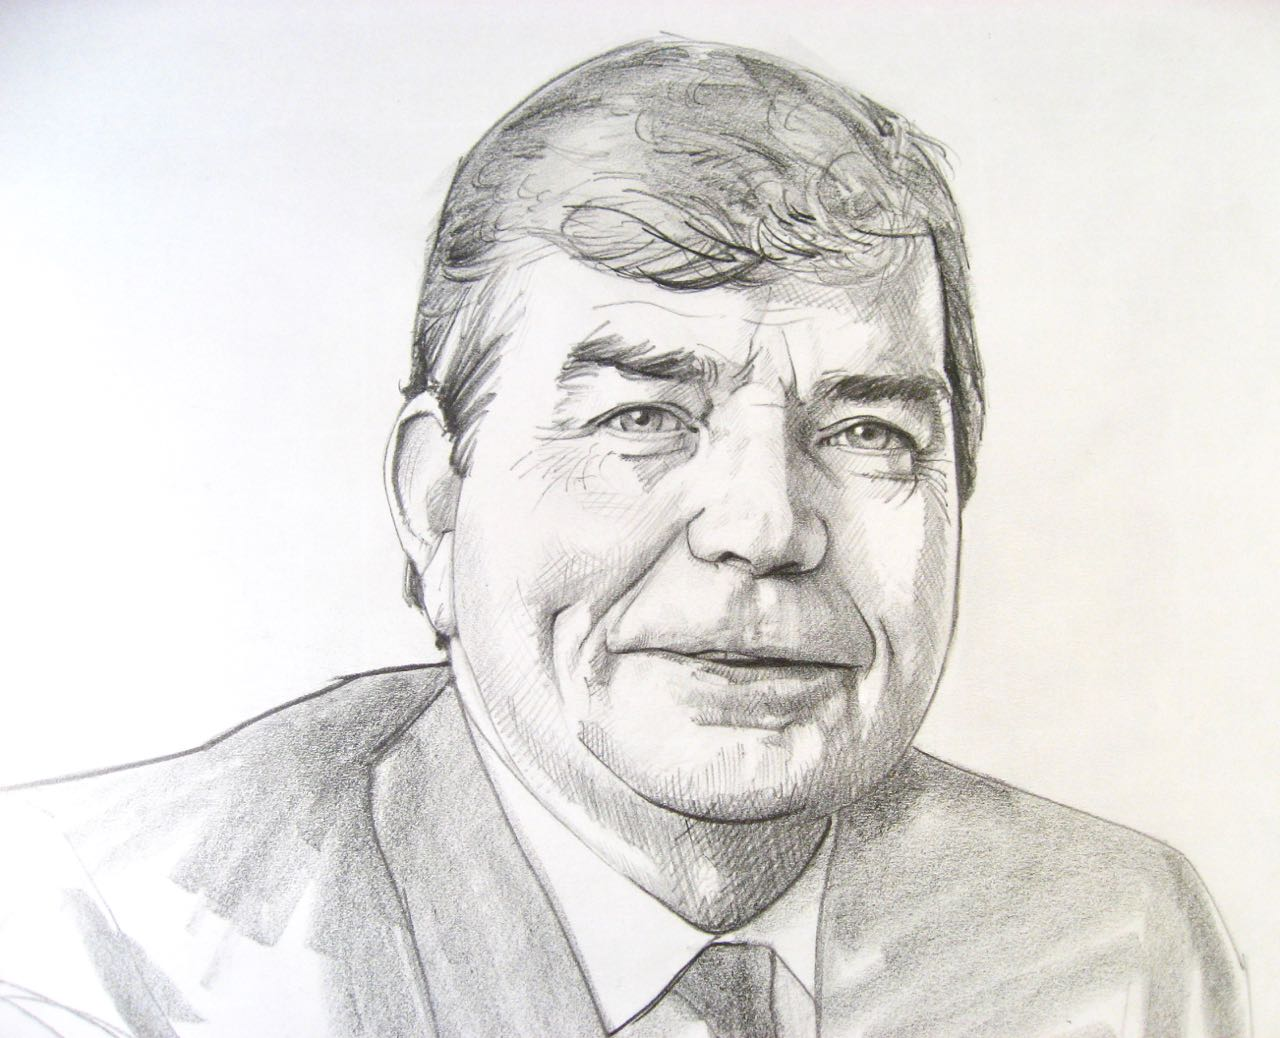 Sketch for portrait